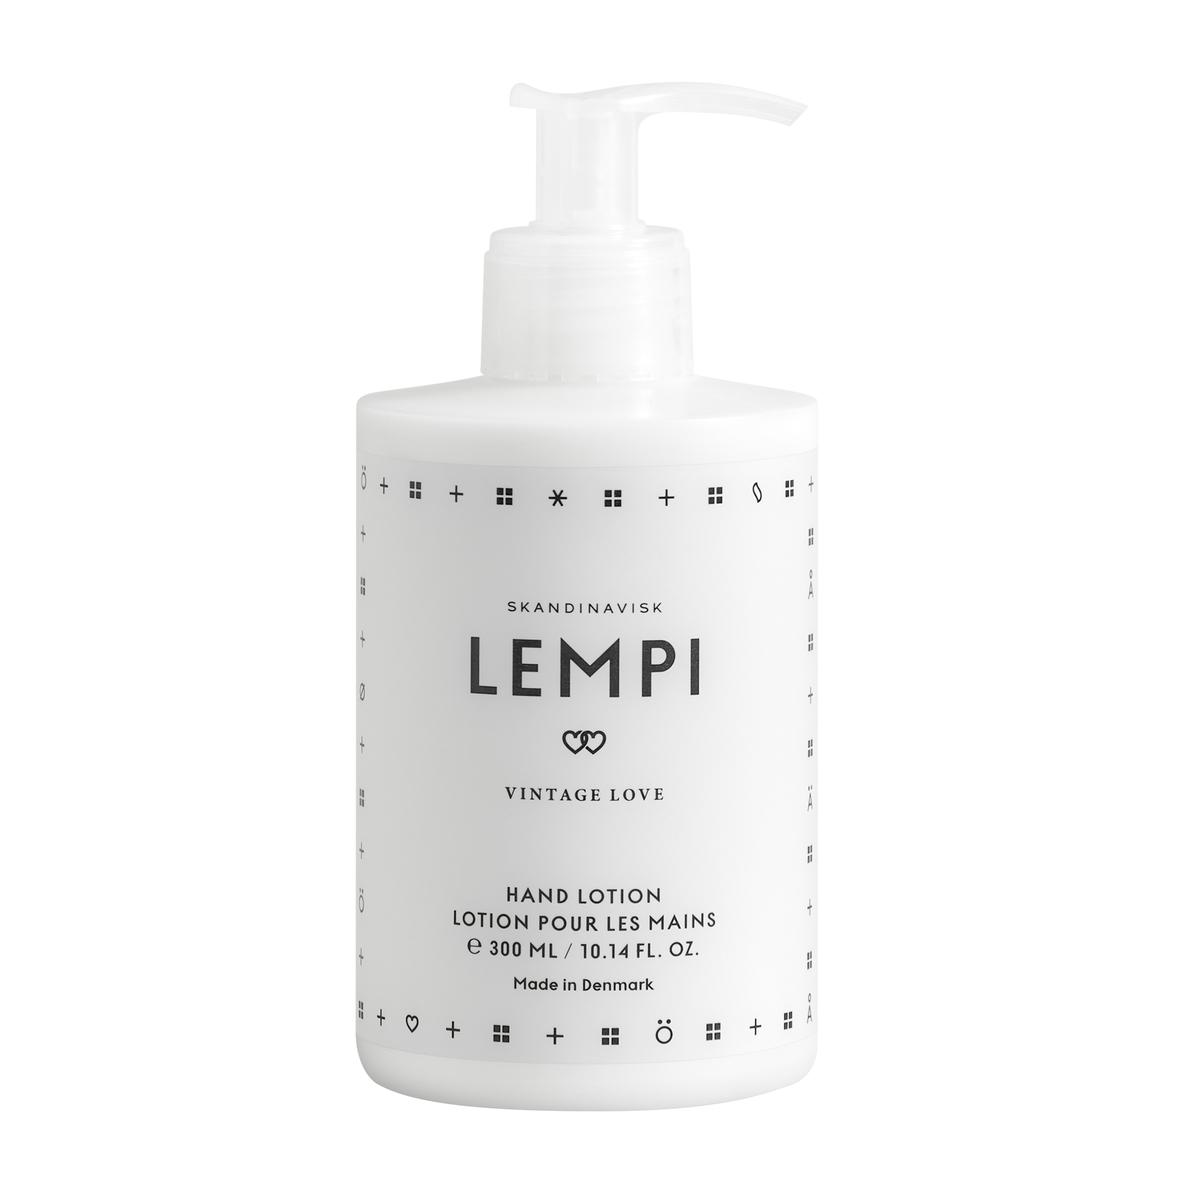 Hand lotion LEMPI, 300 ml